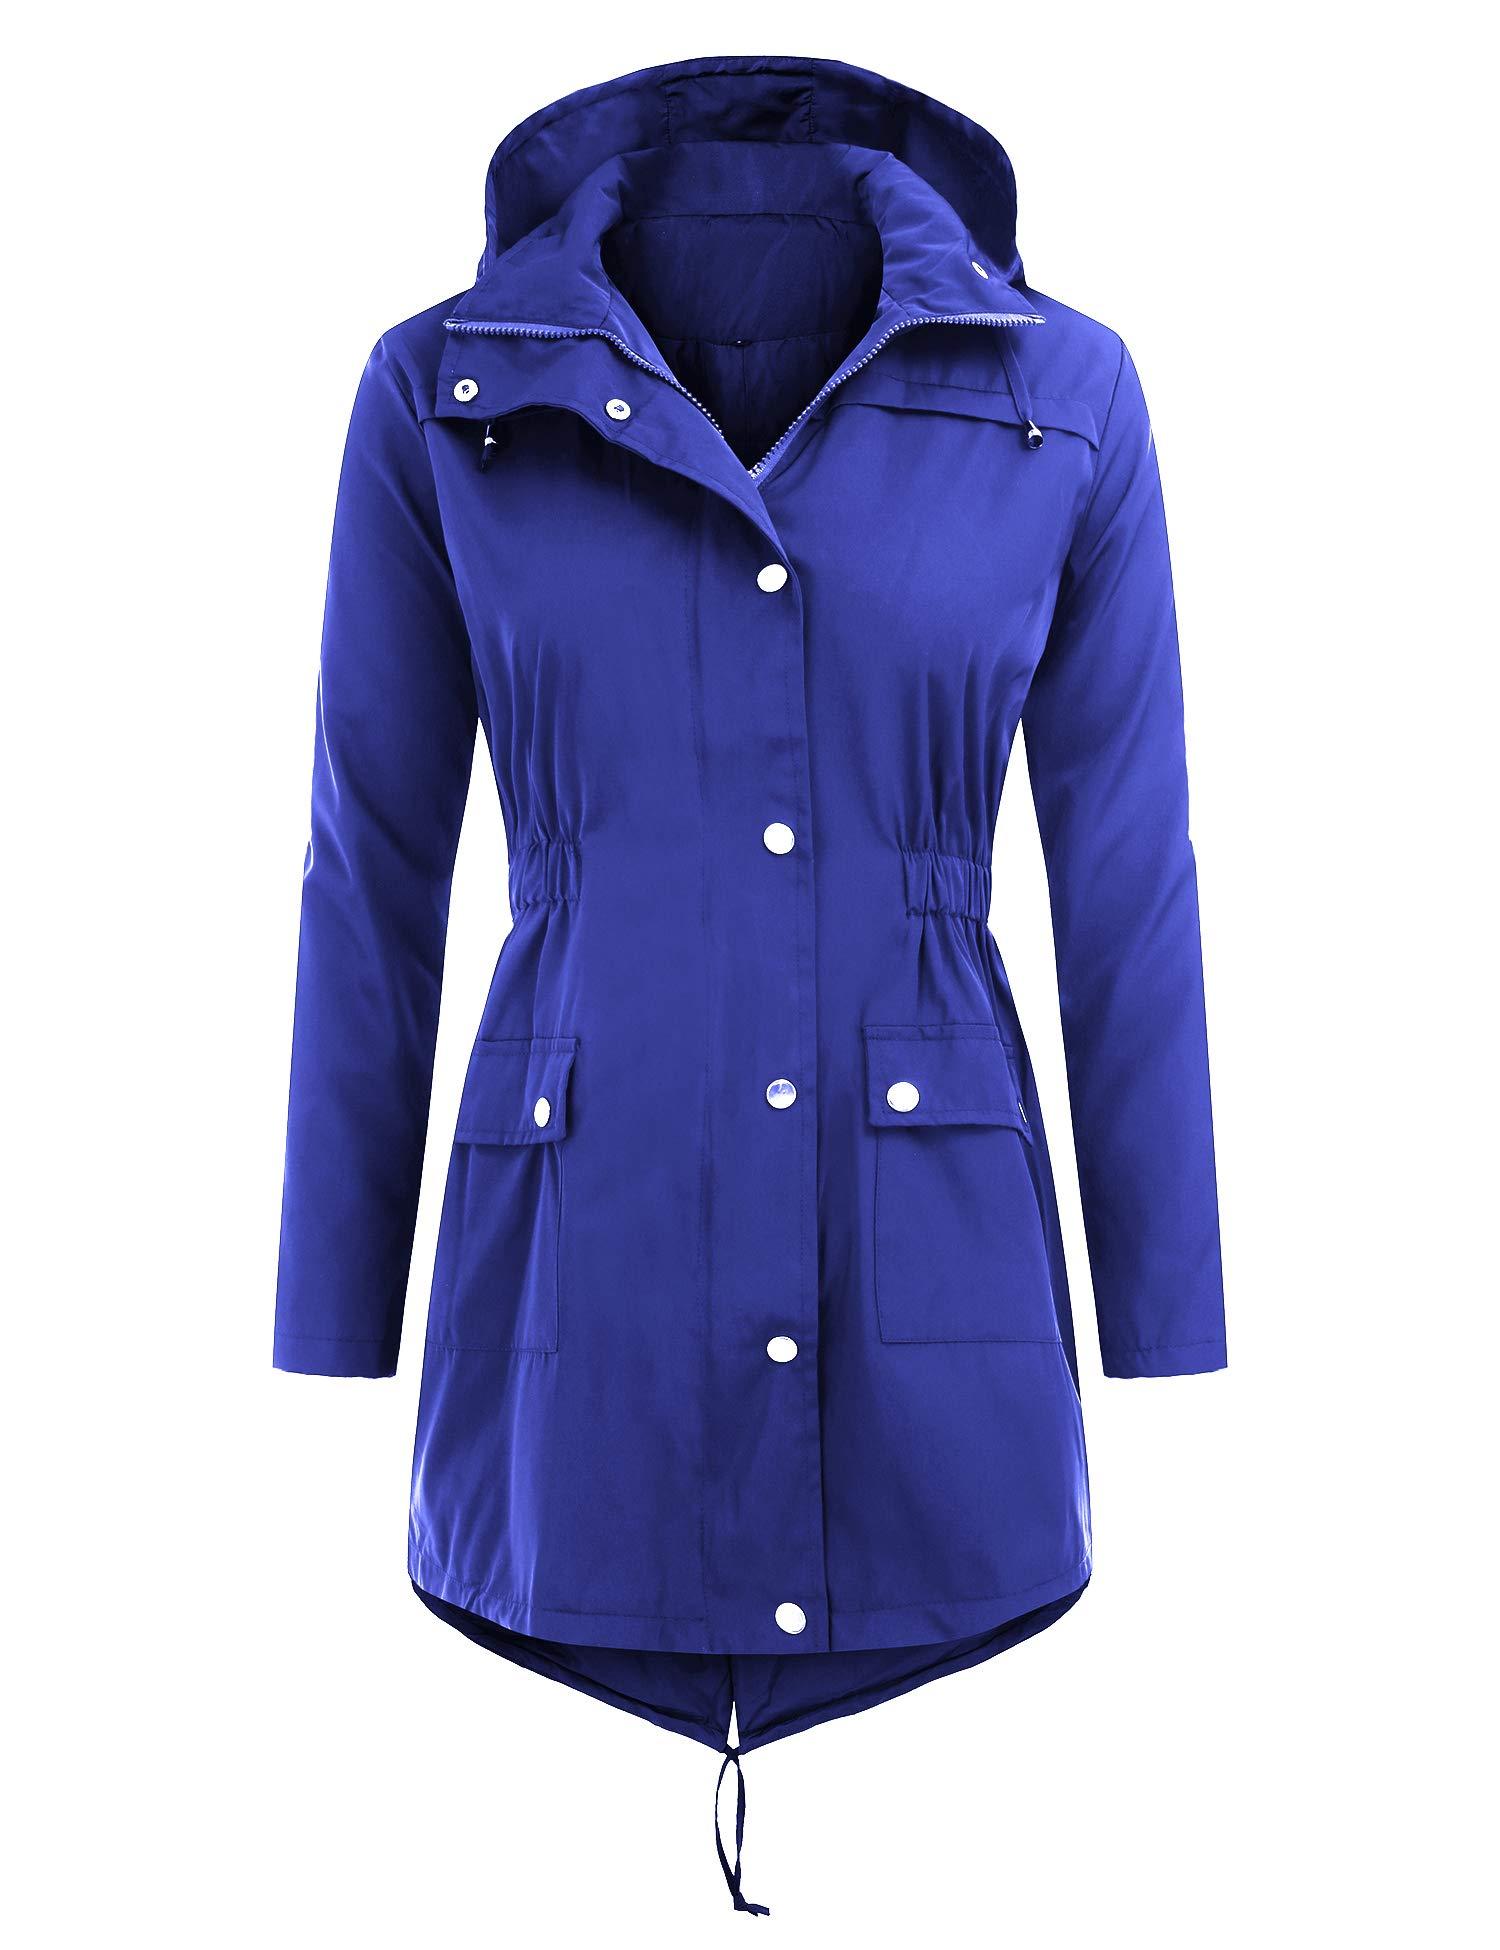 Uniboutique Raincoat Waterproof Outdoor Hooded Lightweight Rain Jacket Windbreaker by Uniboutique (Image #2)